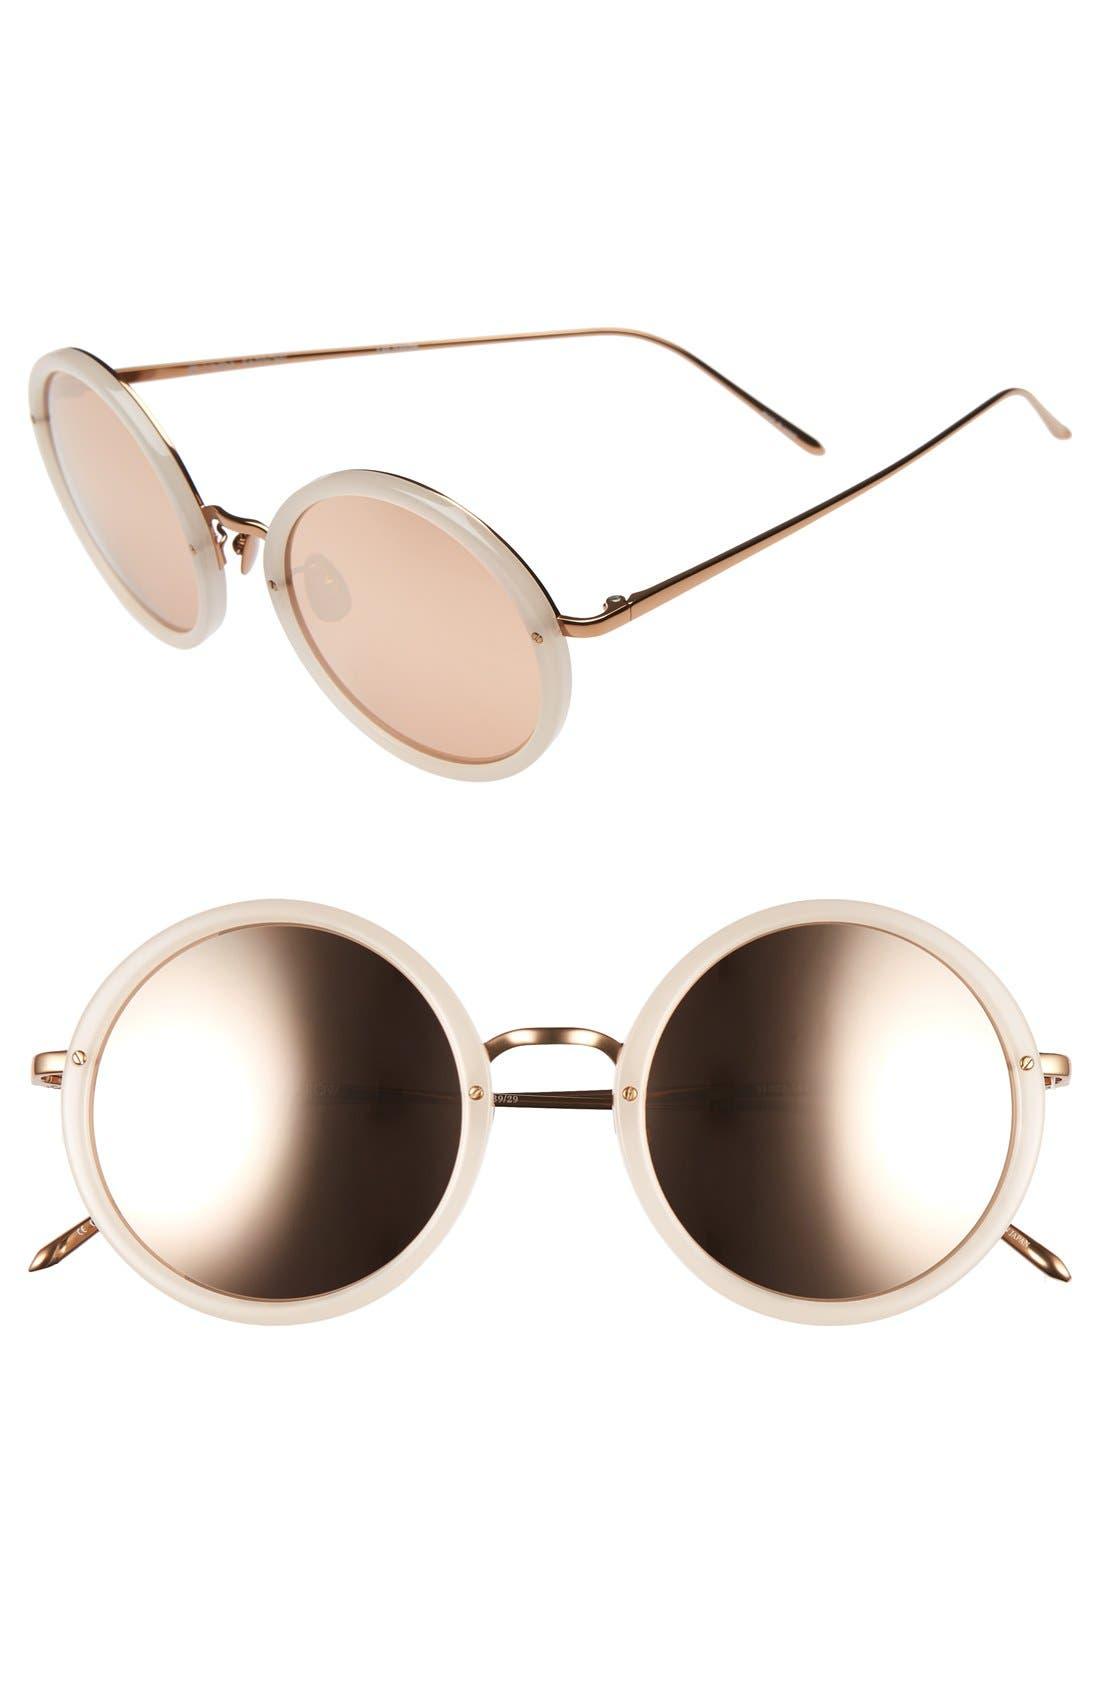 51mm Round 18 Karat Rose Gold Trim Sunglasses,                         Main,                         color, 680